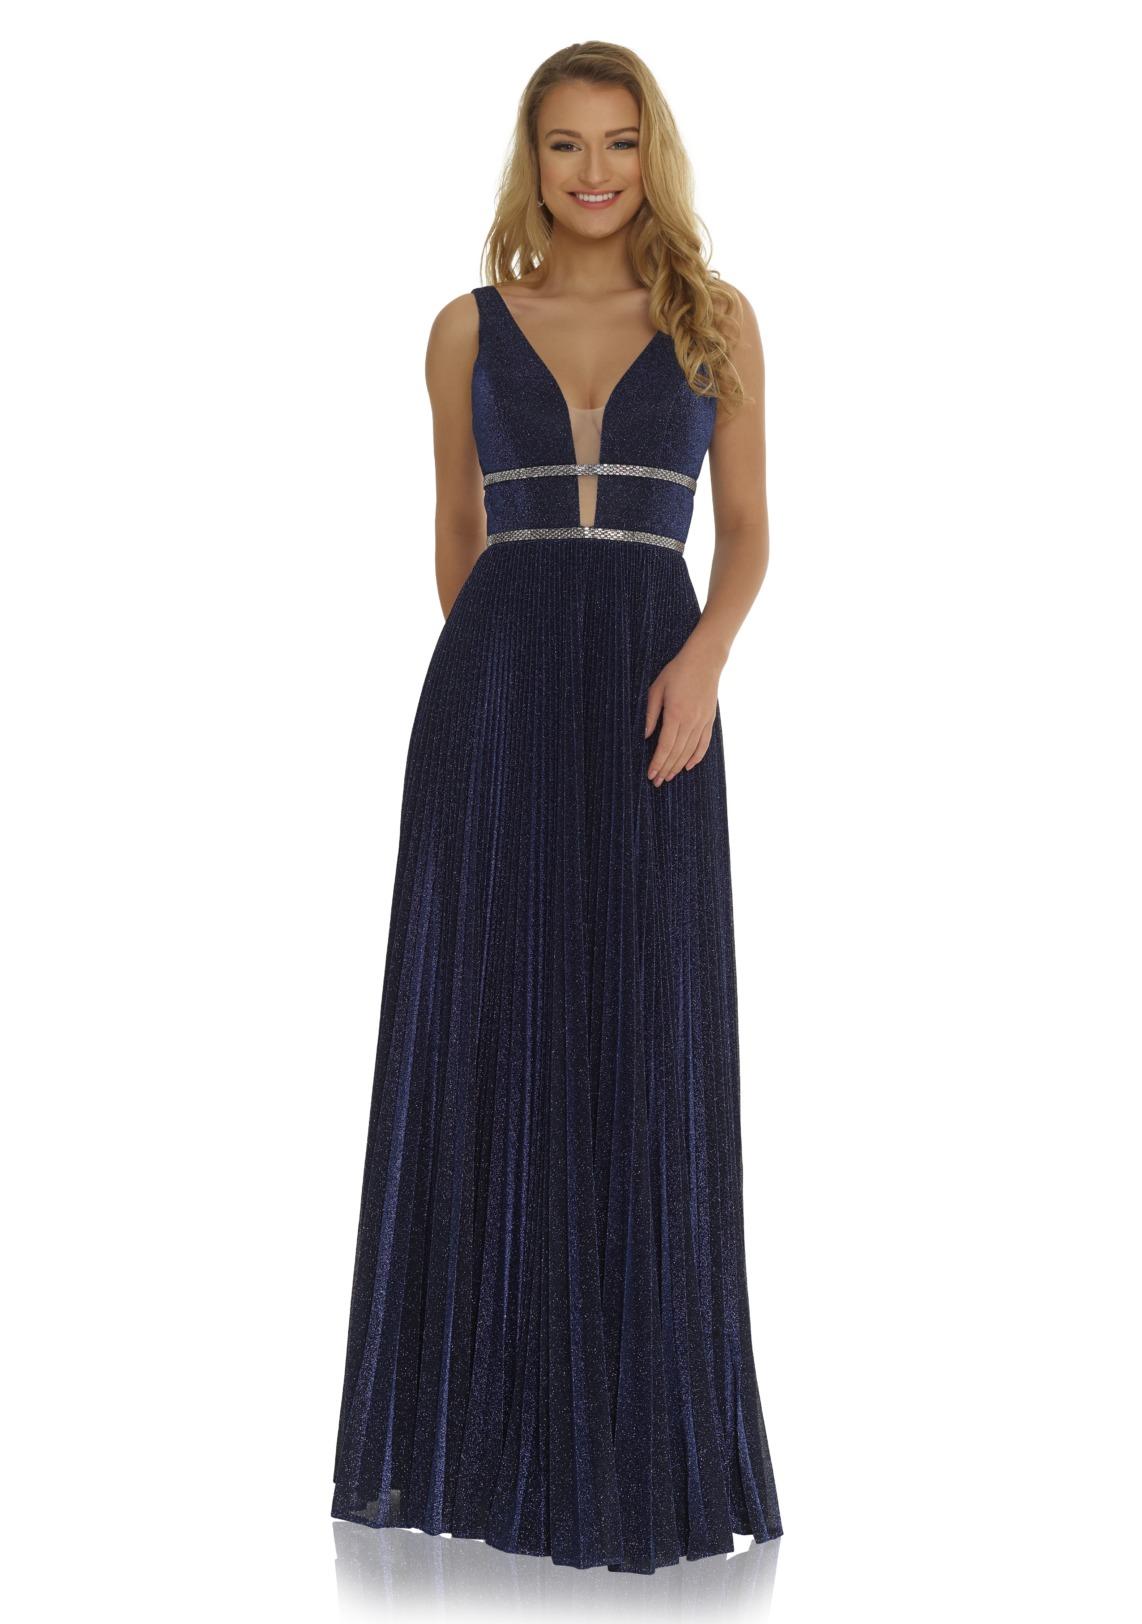 Abiball Kleid lang - navy blau dunkelblau plissee glitzer